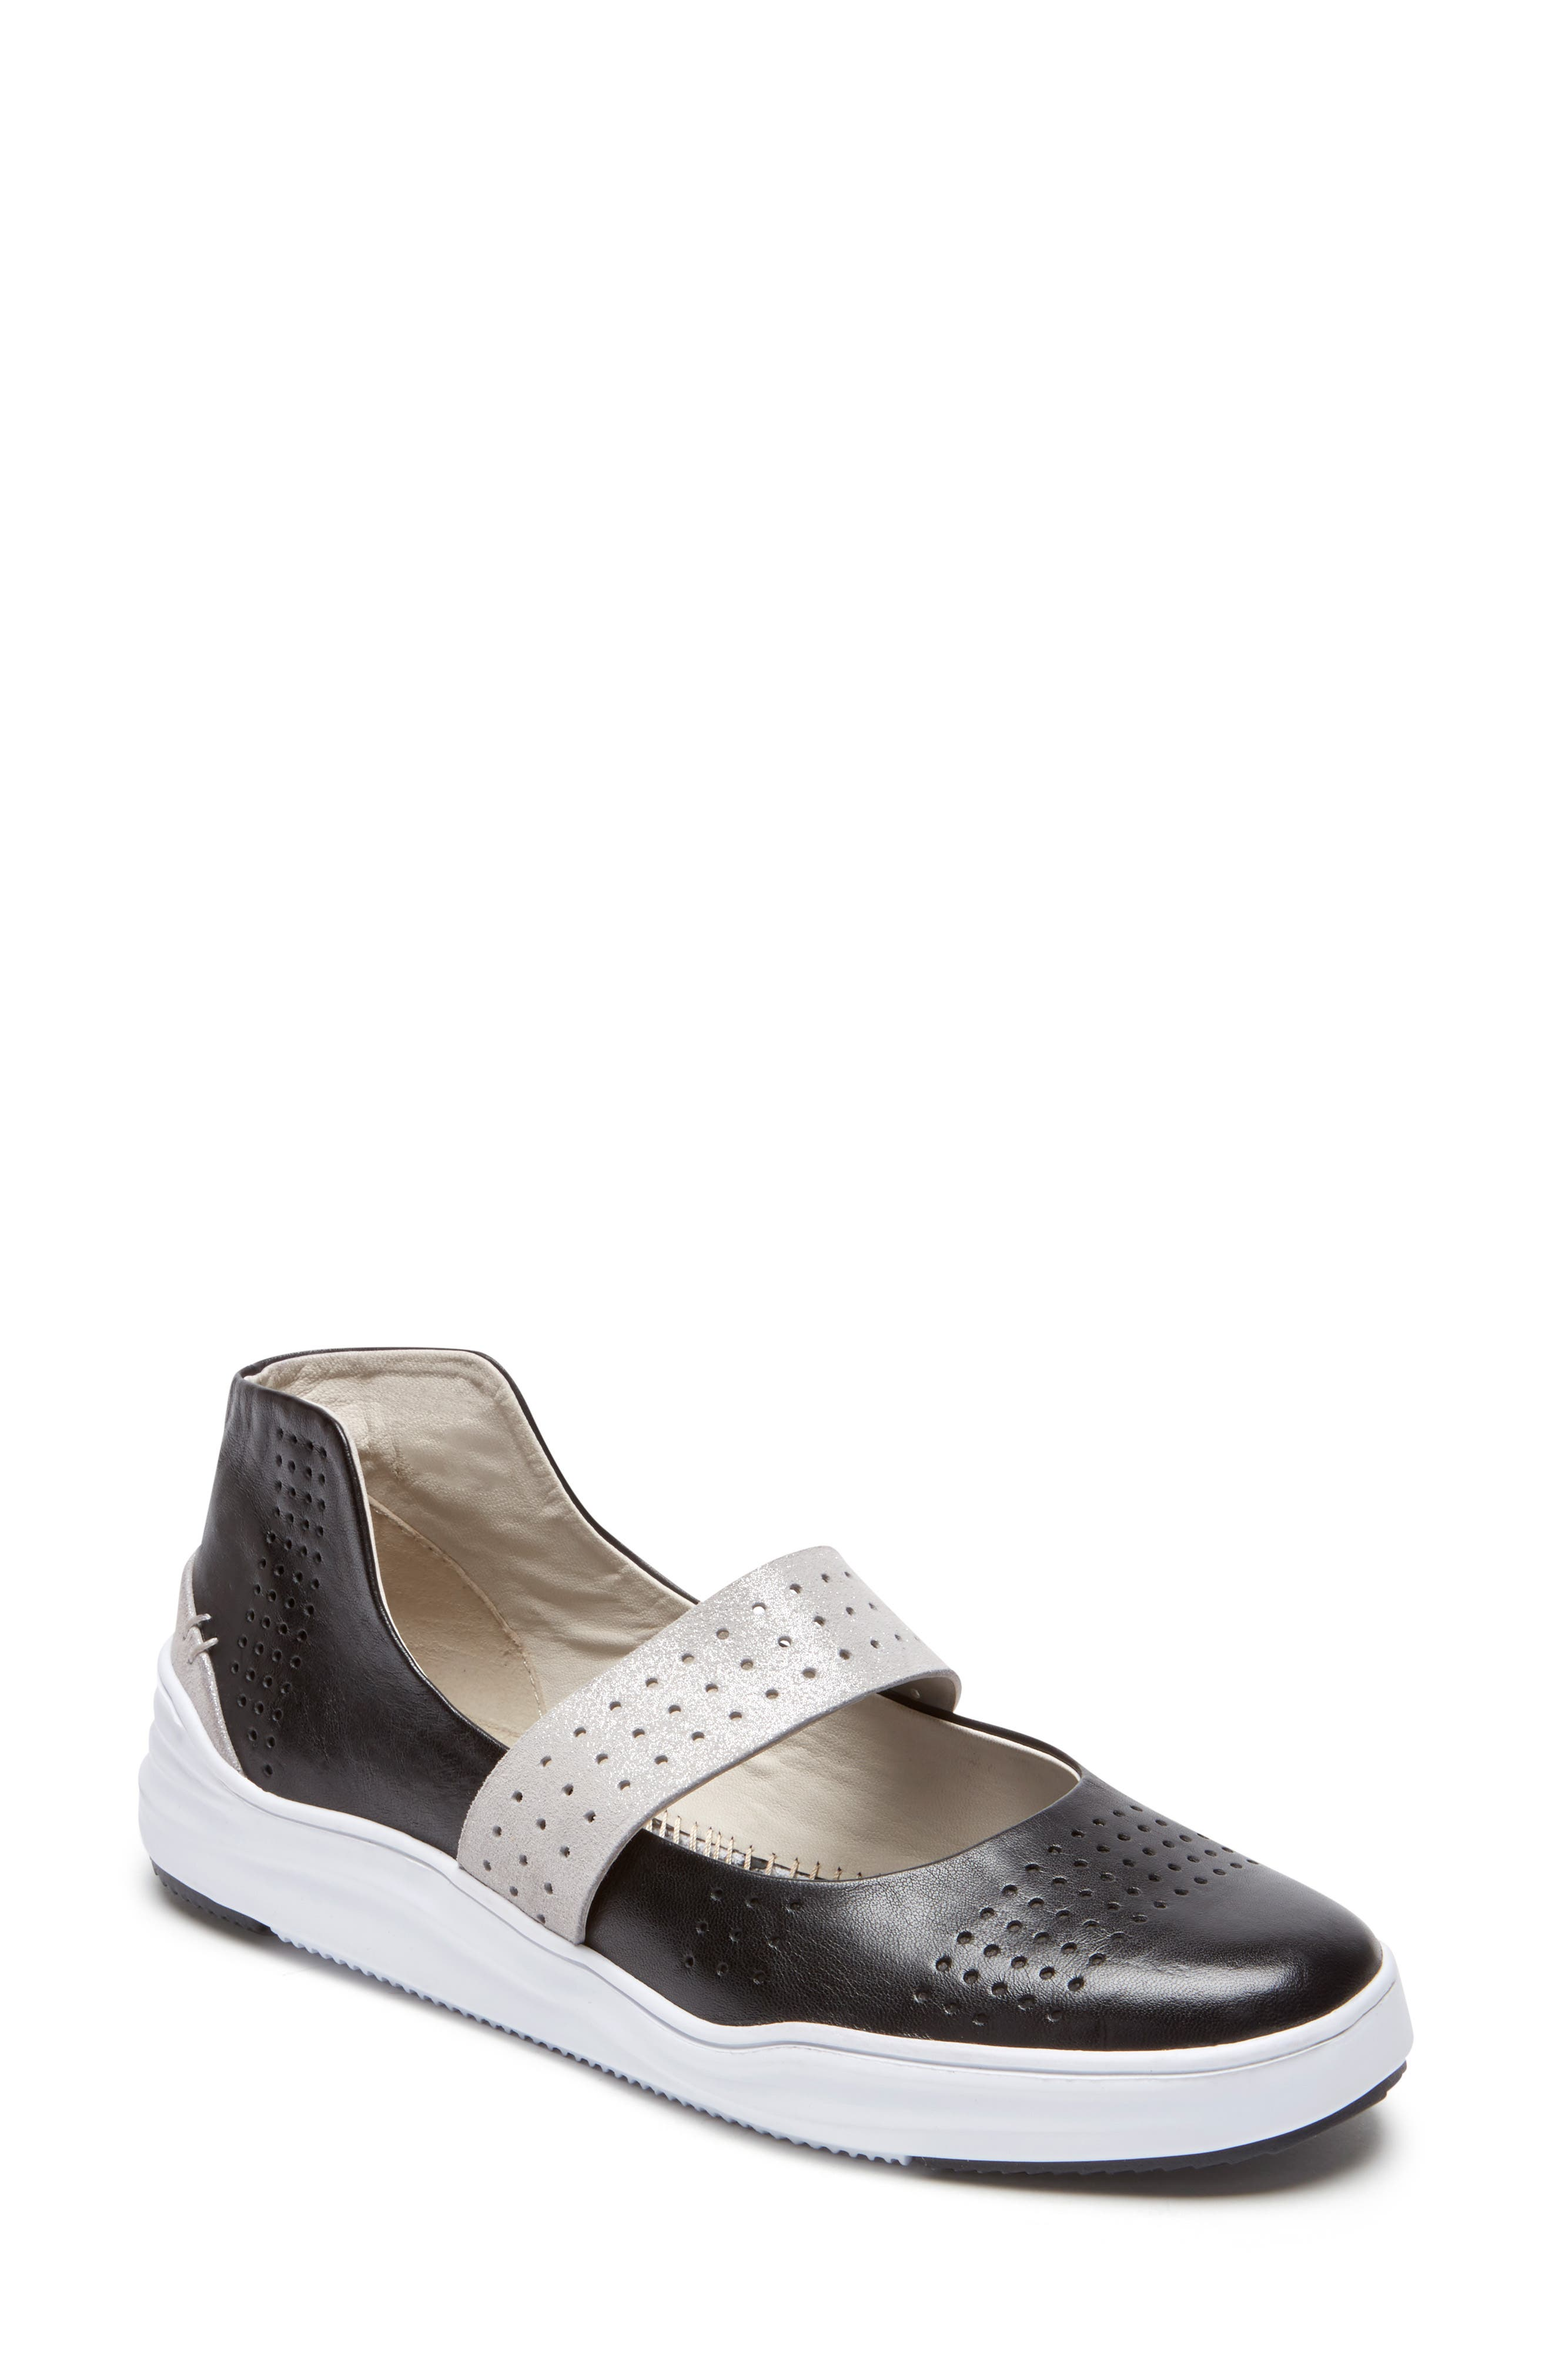 Rockport Cobb Hill Cady Mary Jane Sneaker, Black